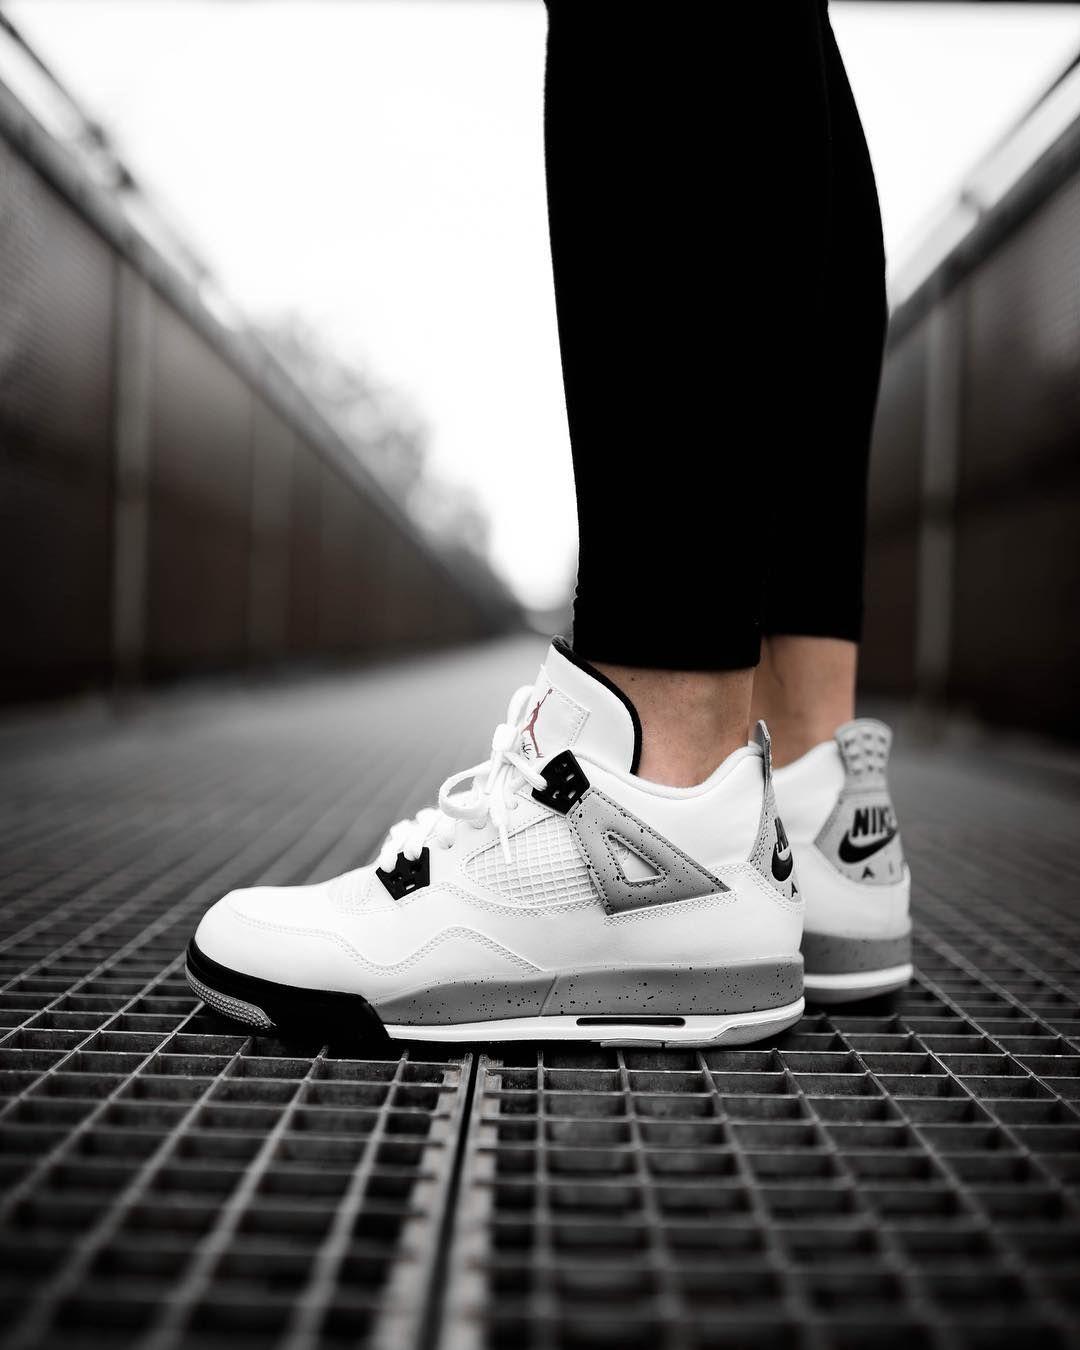 Air jordans, Nike id, Jordan shoes